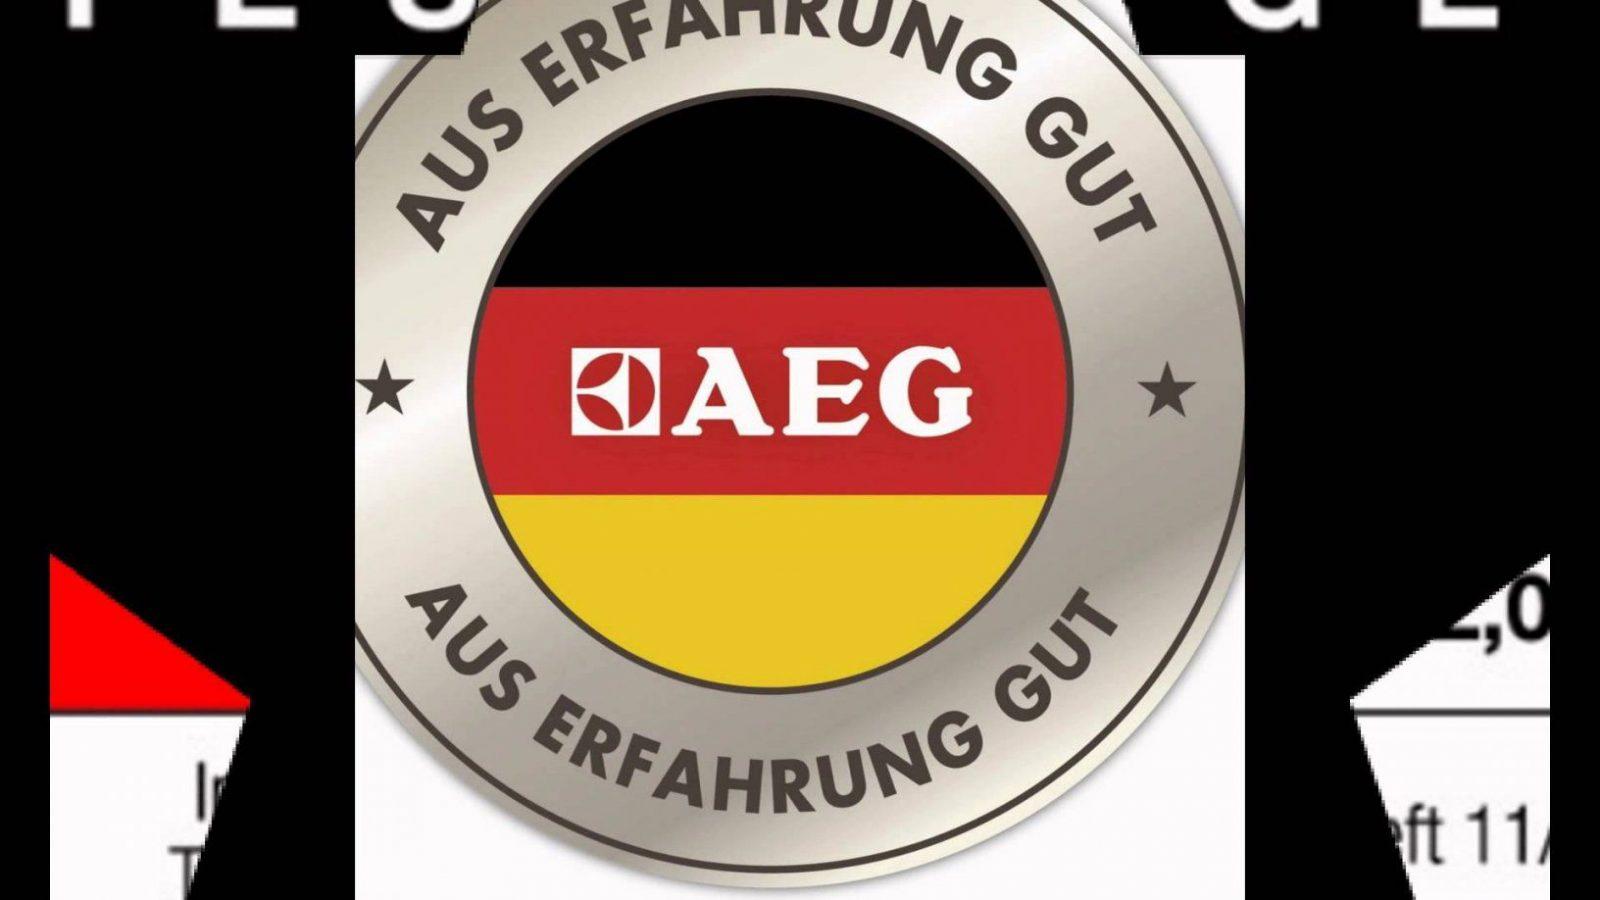 Aeg Eco Li 60 Ultrapower Ag 5012 Handstaubsauger  Youtube von Aeg Eco Li 60 Ultrapower Ag 5022 Bild